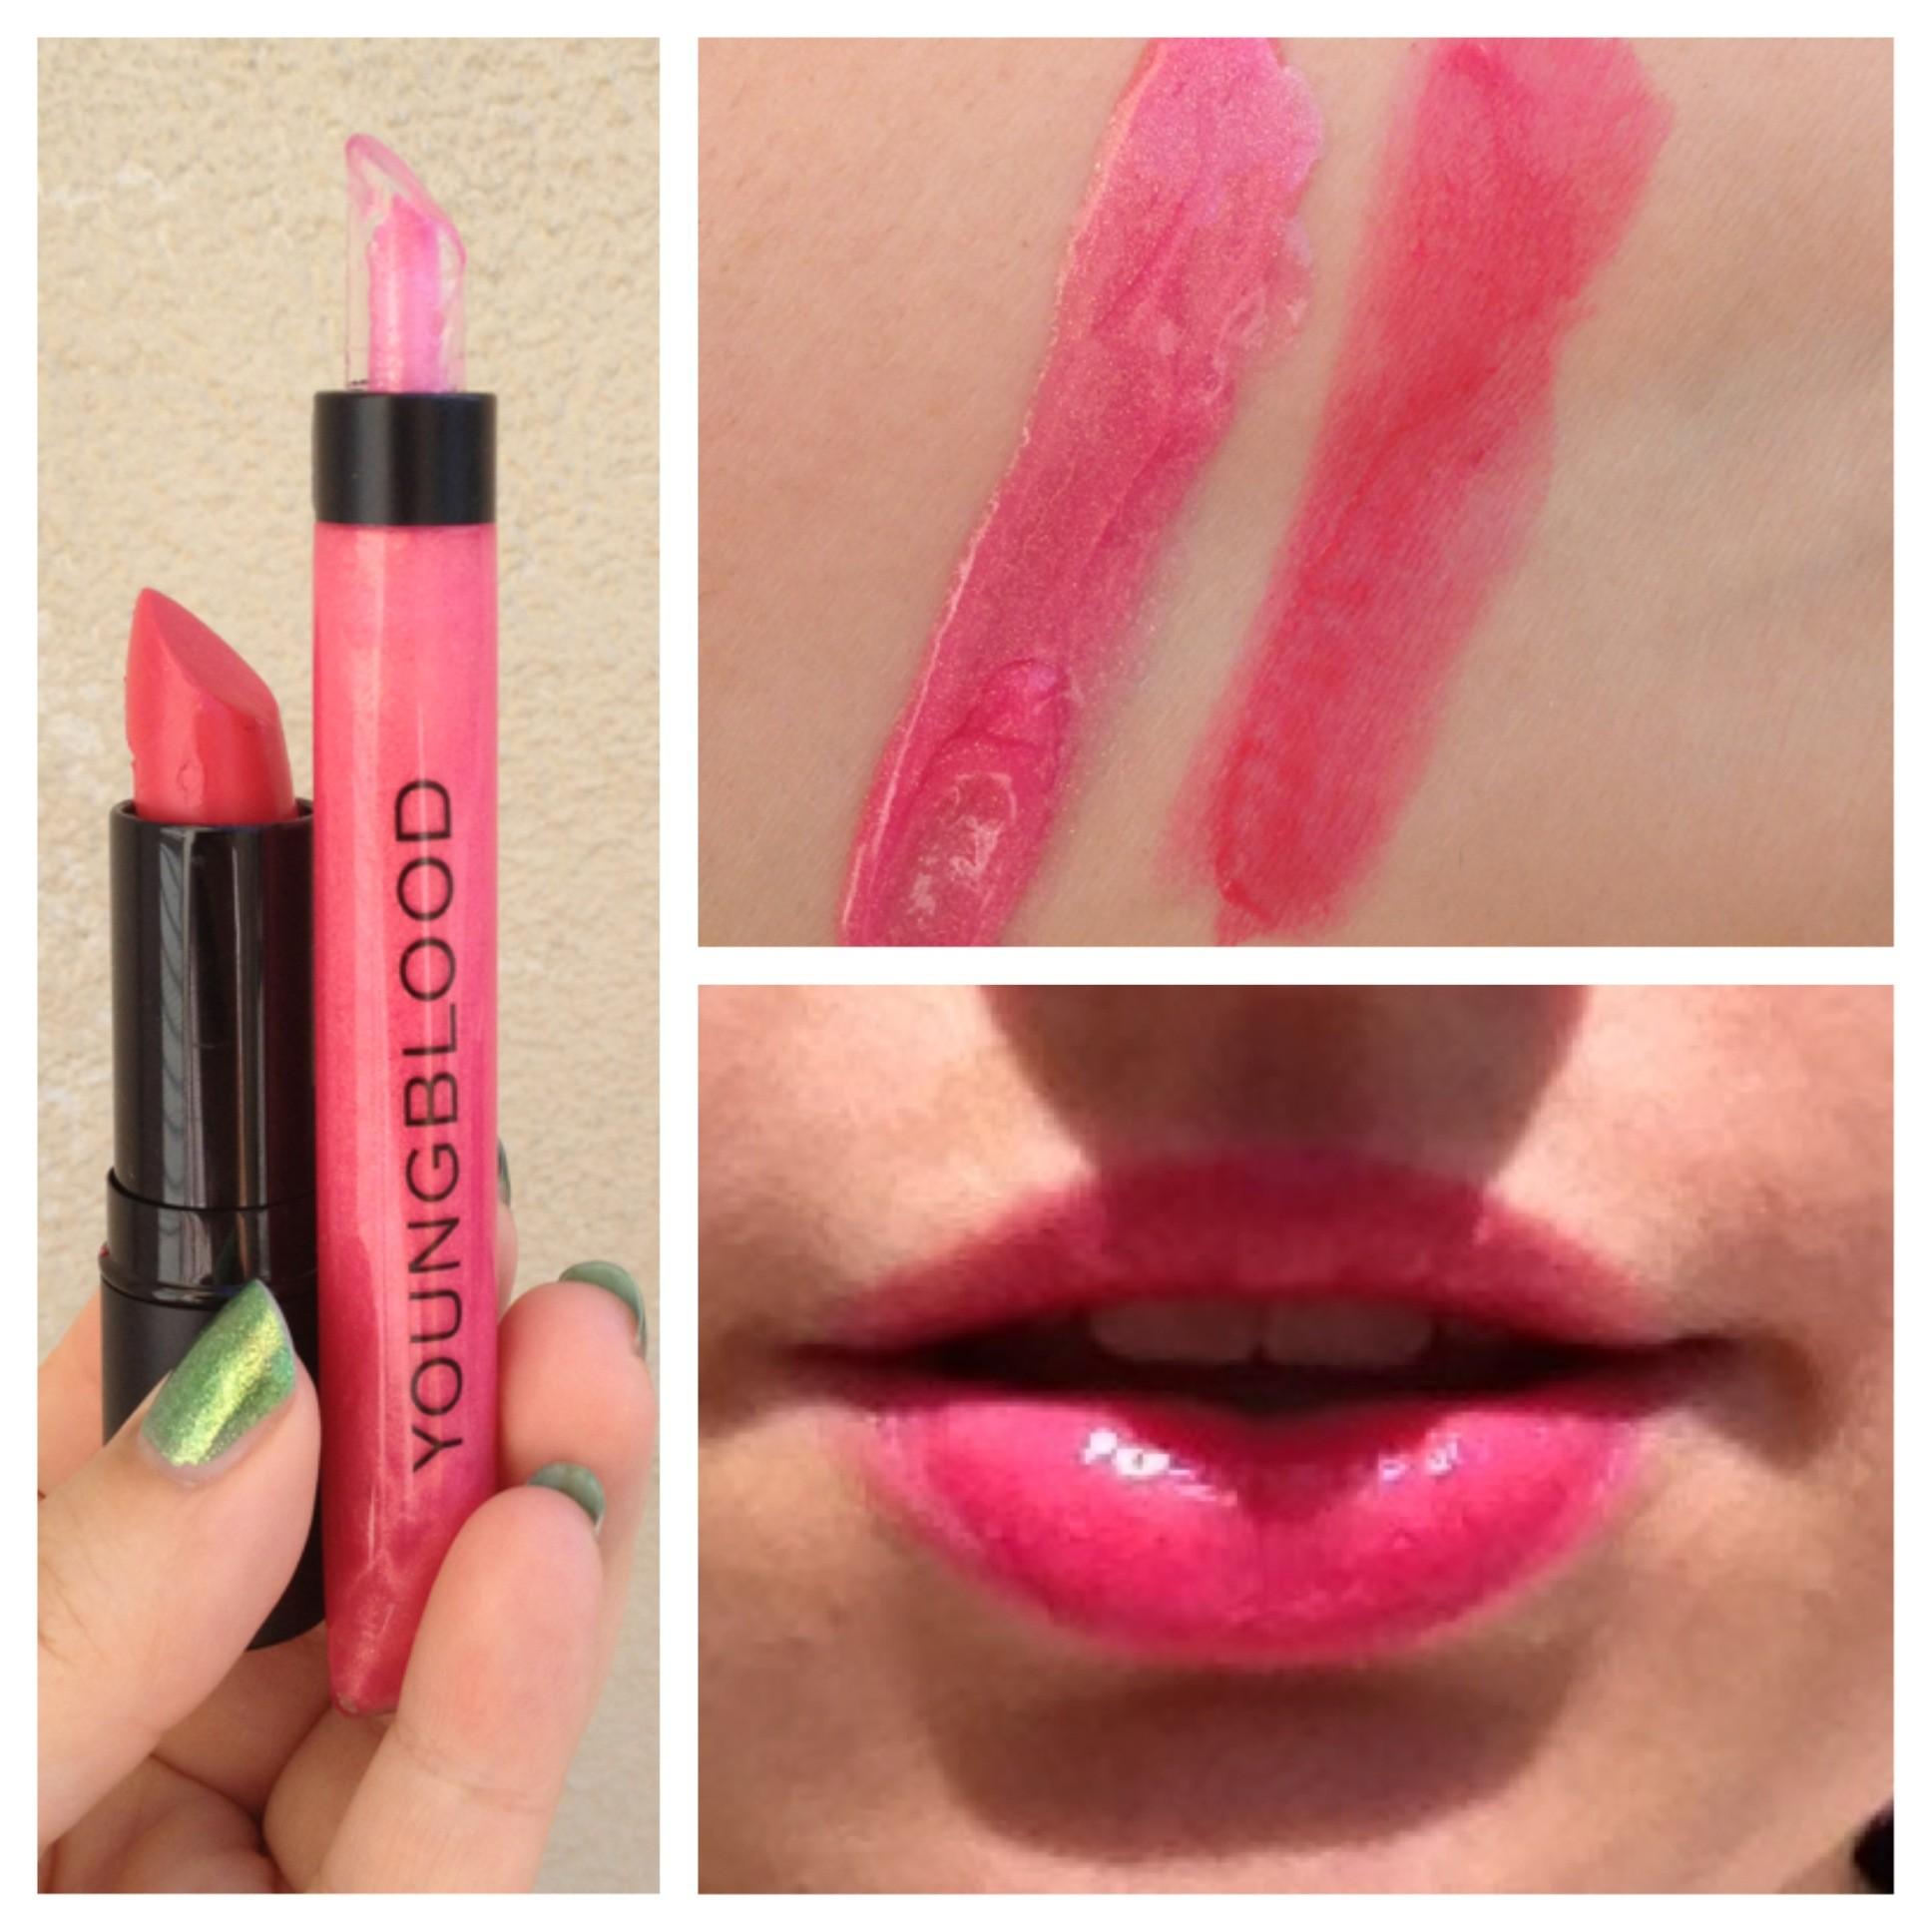 Youngblood Summer Lipstick